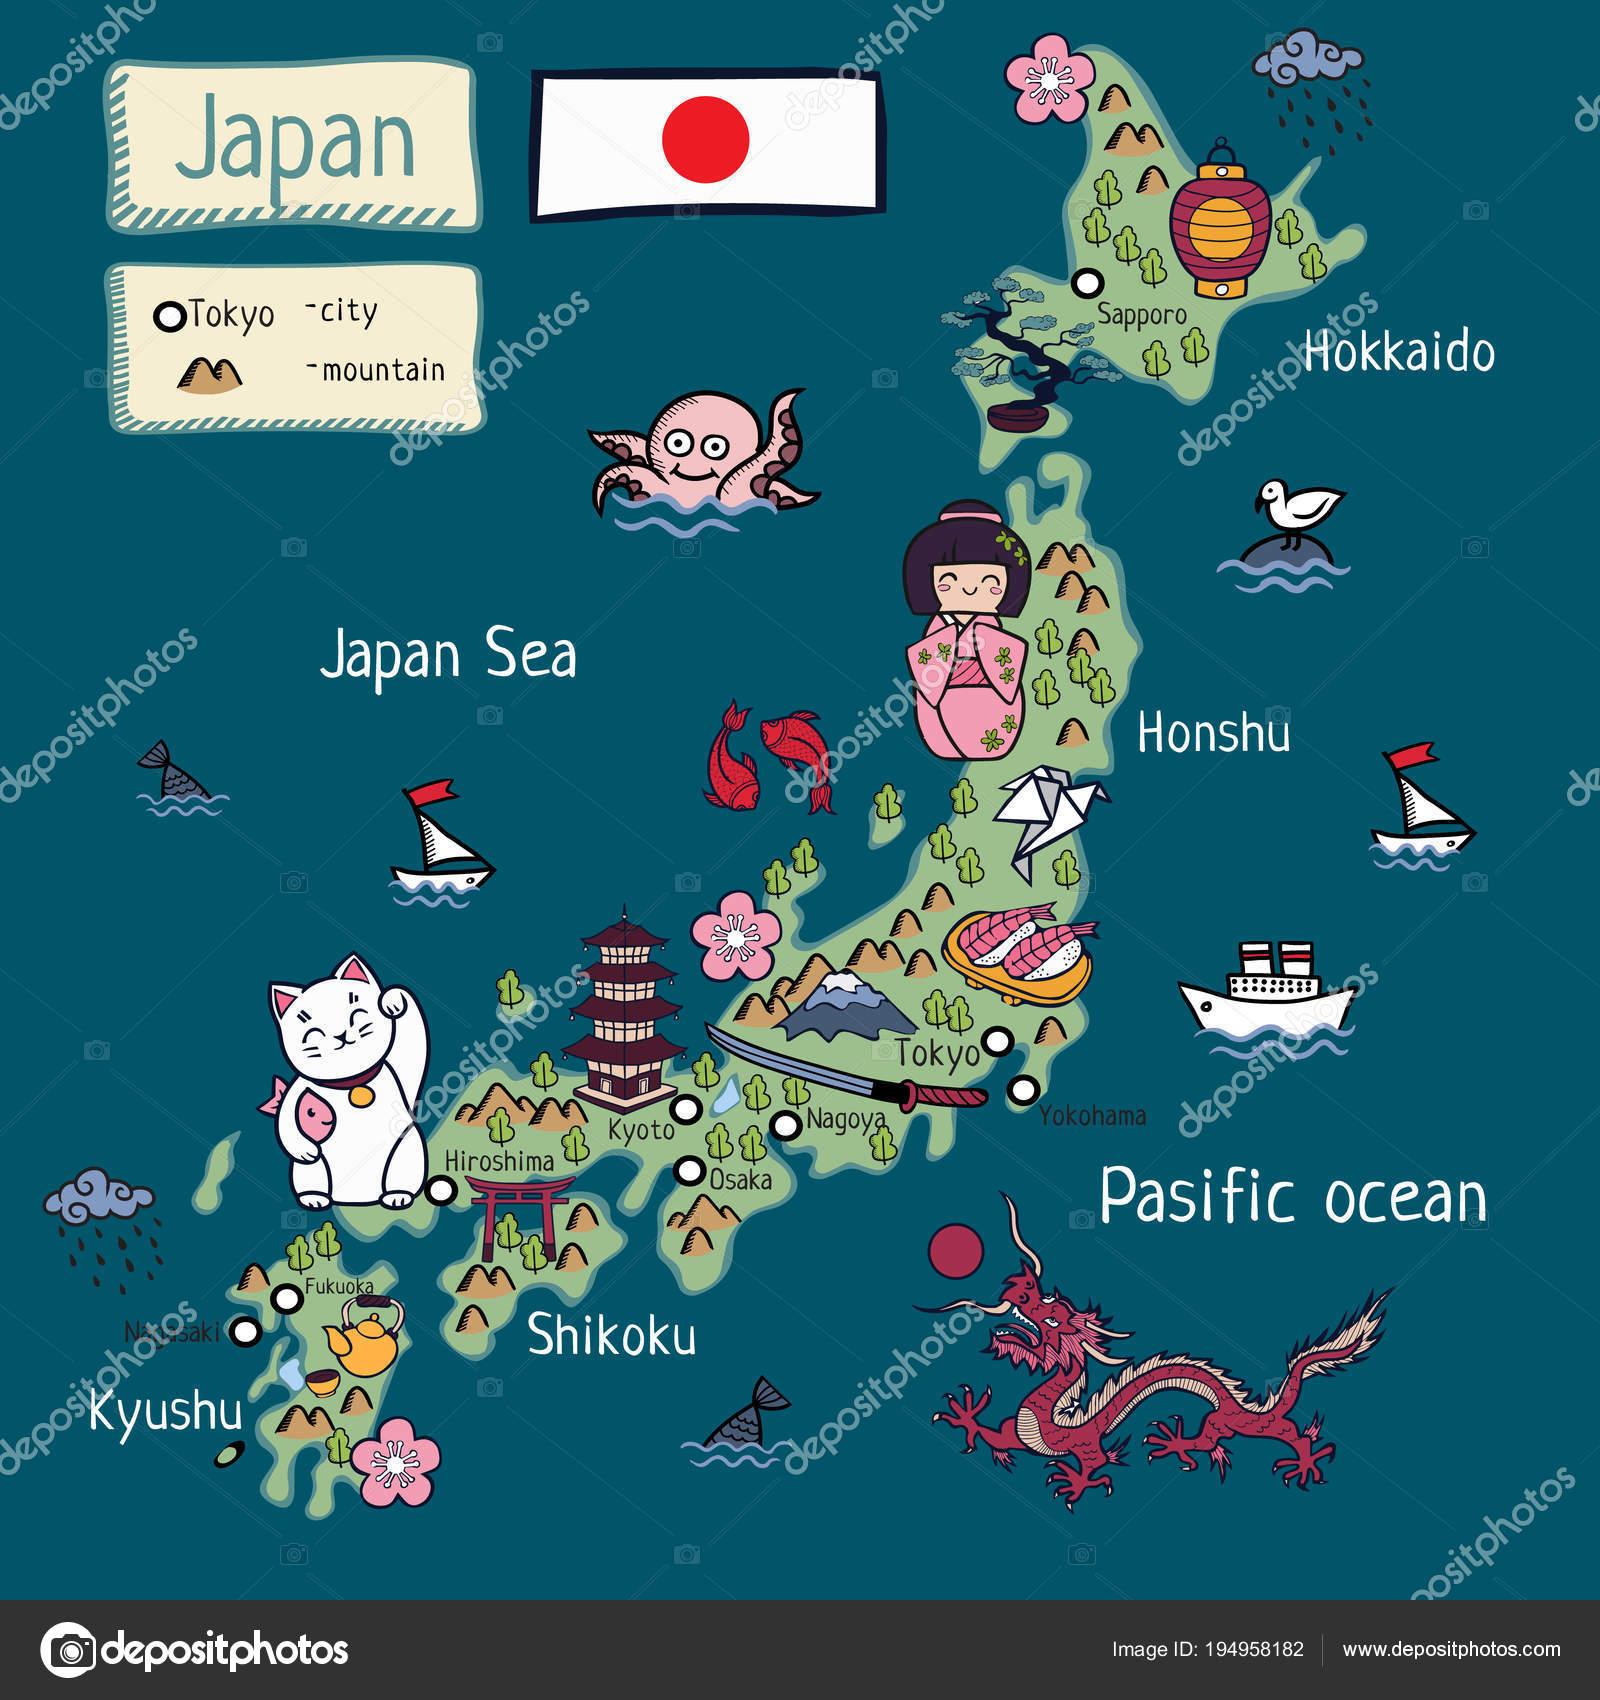 Cartoon Map Japan — Stock Vector © lashmipics #194958182 on map of georgia, map of south america, map of germany, map of canada, honshu japan, hamamatsu japan, yokota japan, sendai japan, map of us, languages spoken in japan, map of florida, map of europe, winter in japan, map of ohio, hyogo japan, map of california, map of the united states, map of north carolina, map of china, map of virginia, kawasaki japan, kanagawa japan, world map japan, printable map japan, hakone japan, map of mexico, map of usa, map of the world, nikko japan, gifu japan, nagoya japan, hiroshima japan, map of italy, info about japan, takayama japan, mountains in japan, map of africa, map of texas,